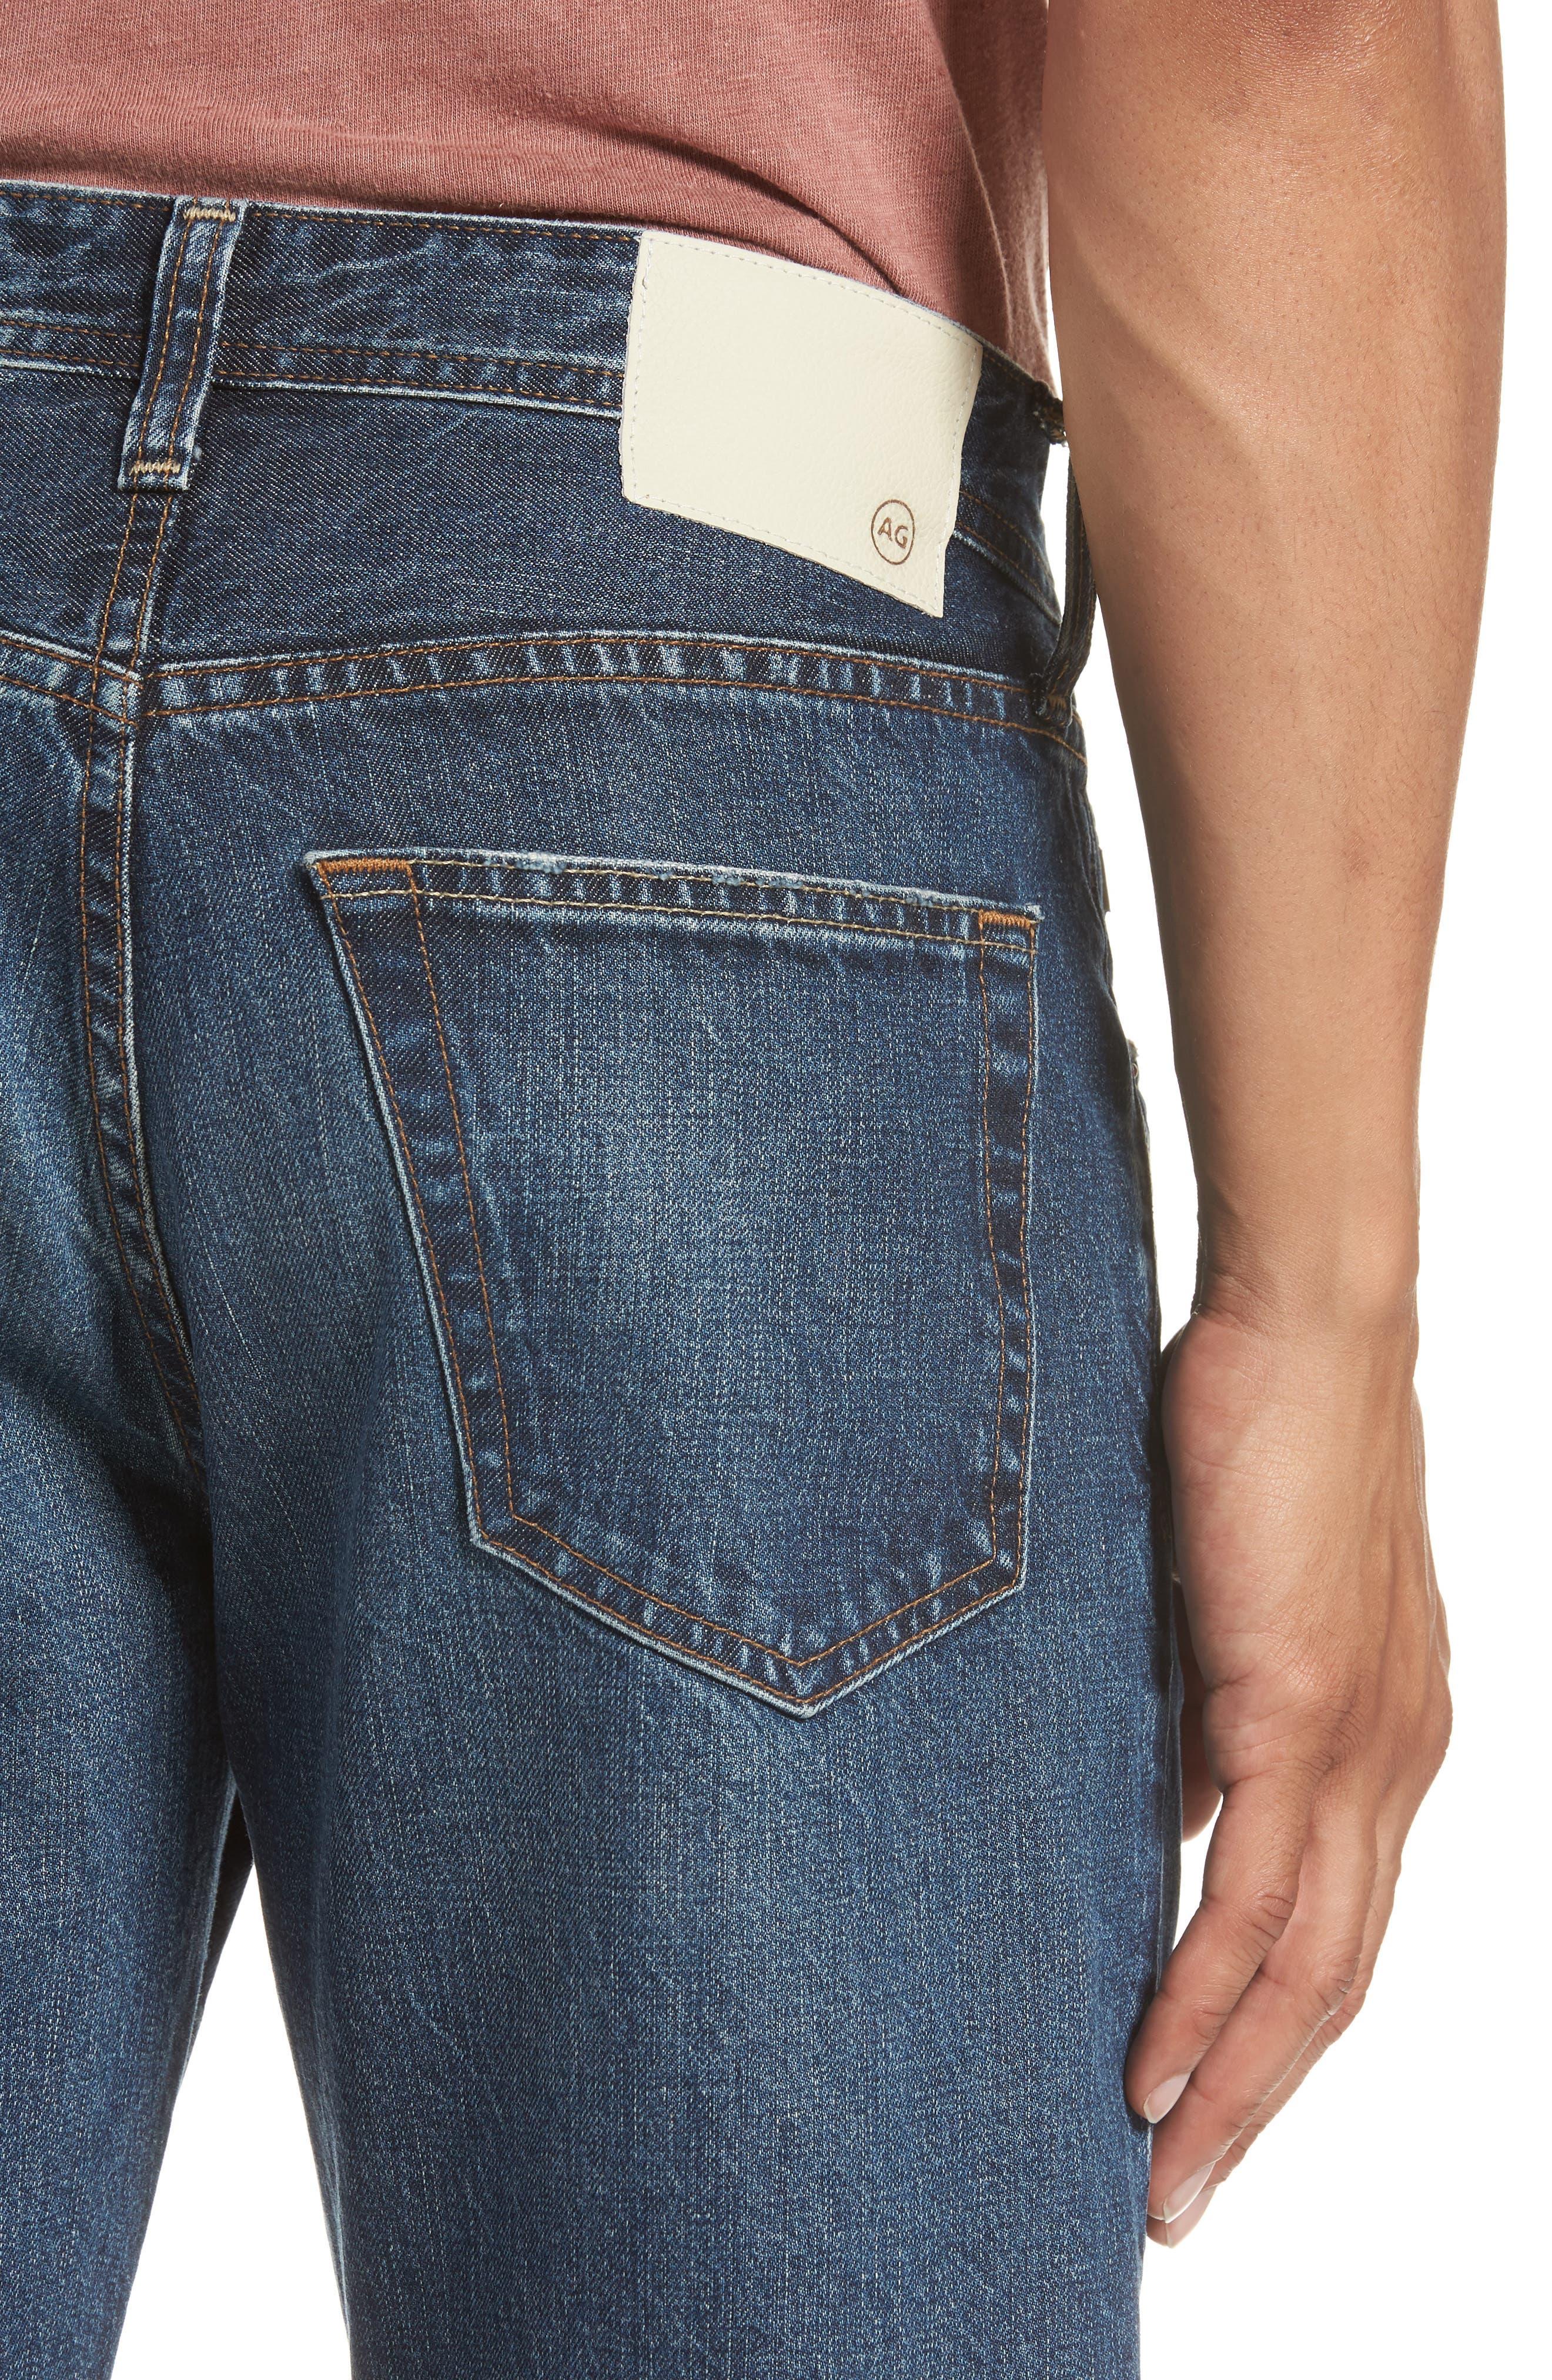 Turner Crop Jeans,                             Alternate thumbnail 4, color,                             5 YEARS WAYFARER